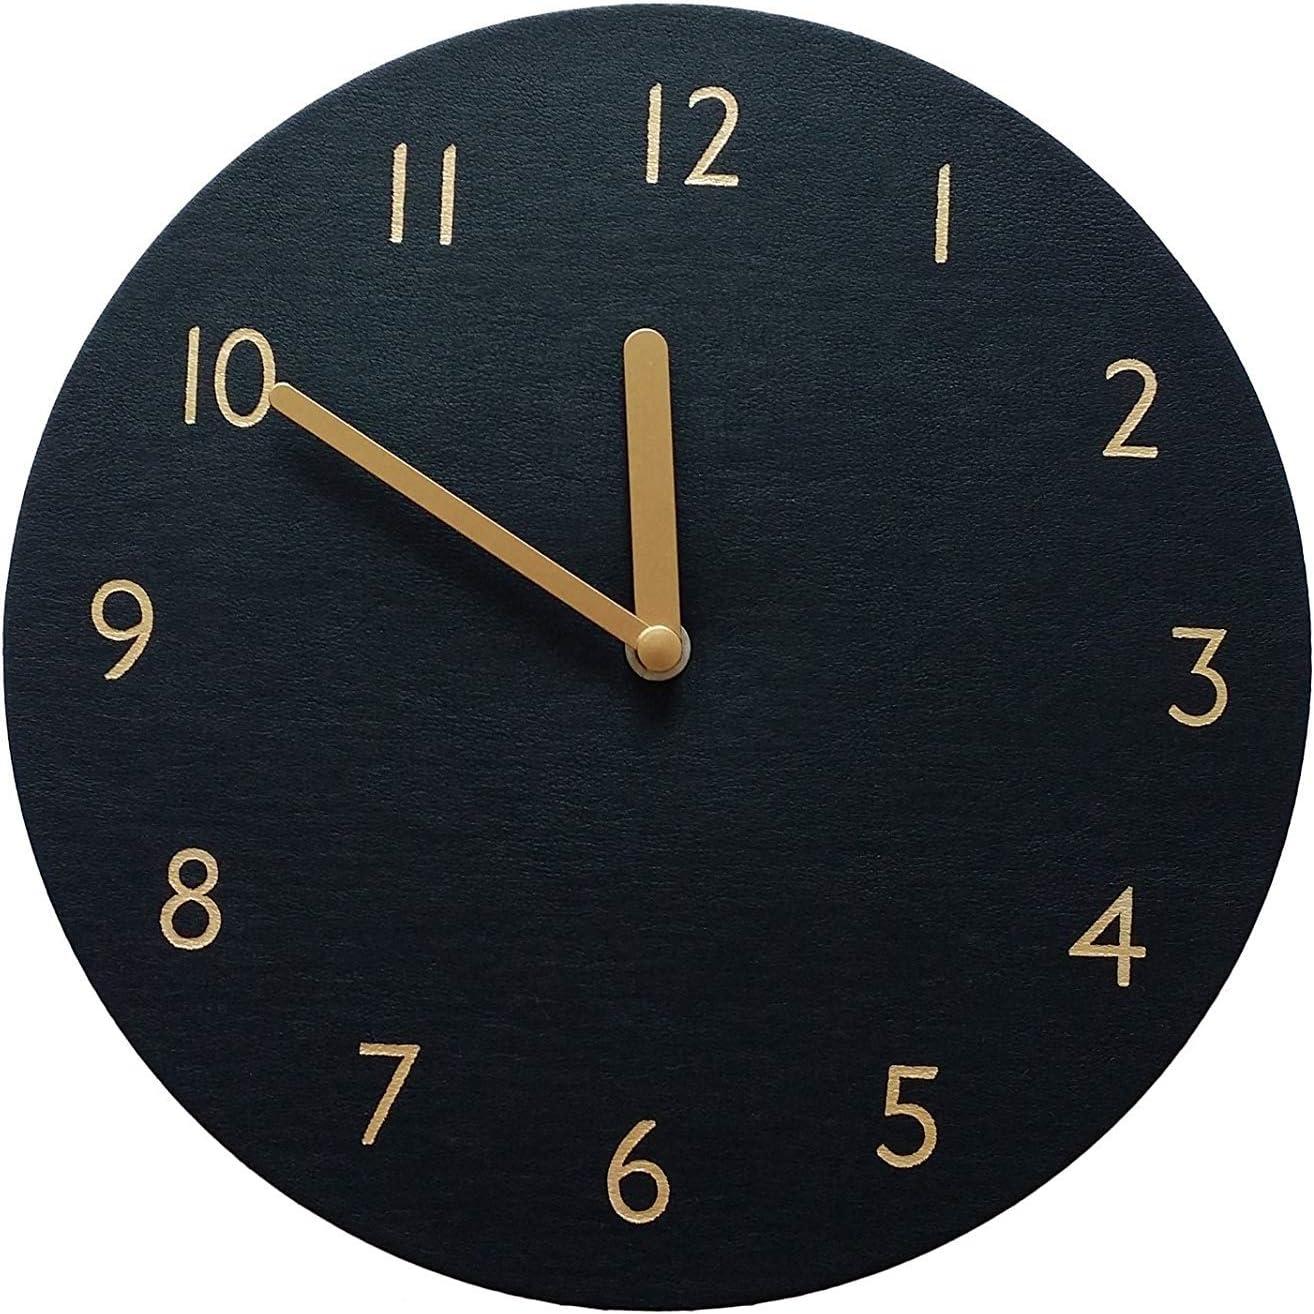 "thehaki Decorative Wall Clock Silent & Non-Ticking Quartz Clock PU Leather Lightweight 0.4lb Round 9"" (Black)"